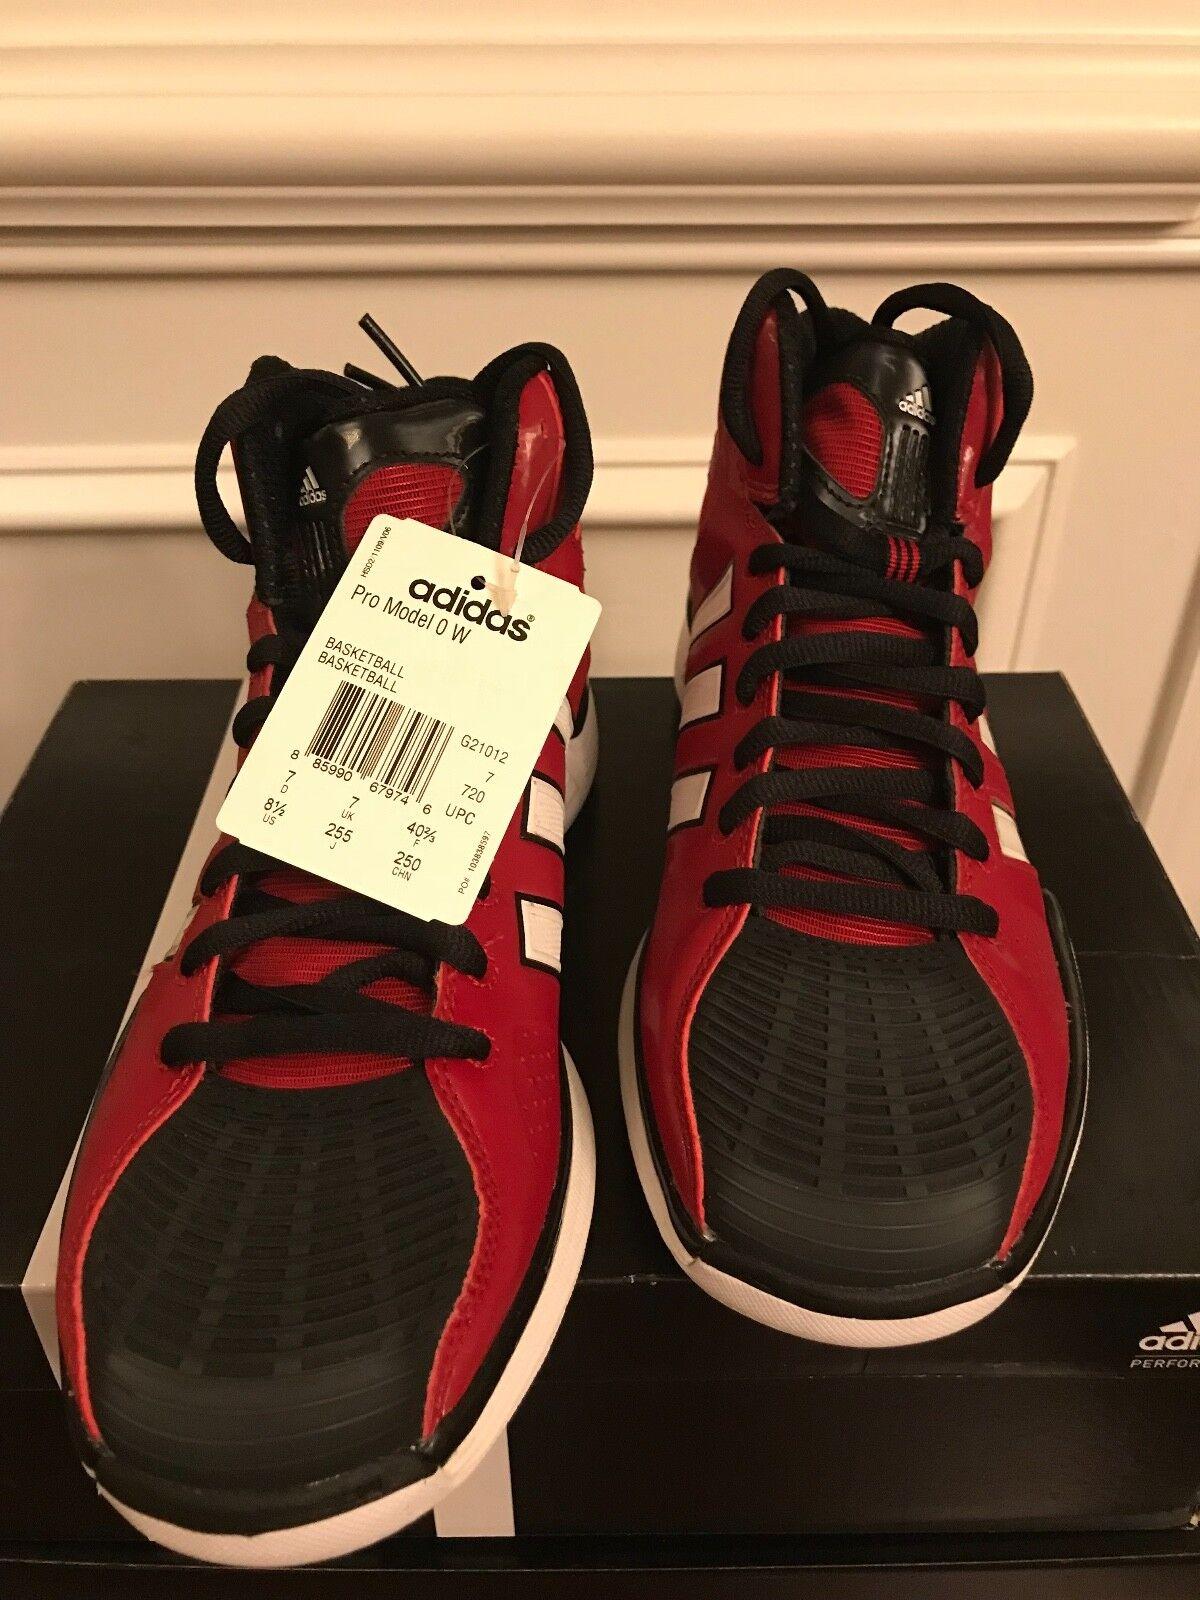 Adidas Pro Model 0 Zero W Damen Basketball Schuhe Sneakers